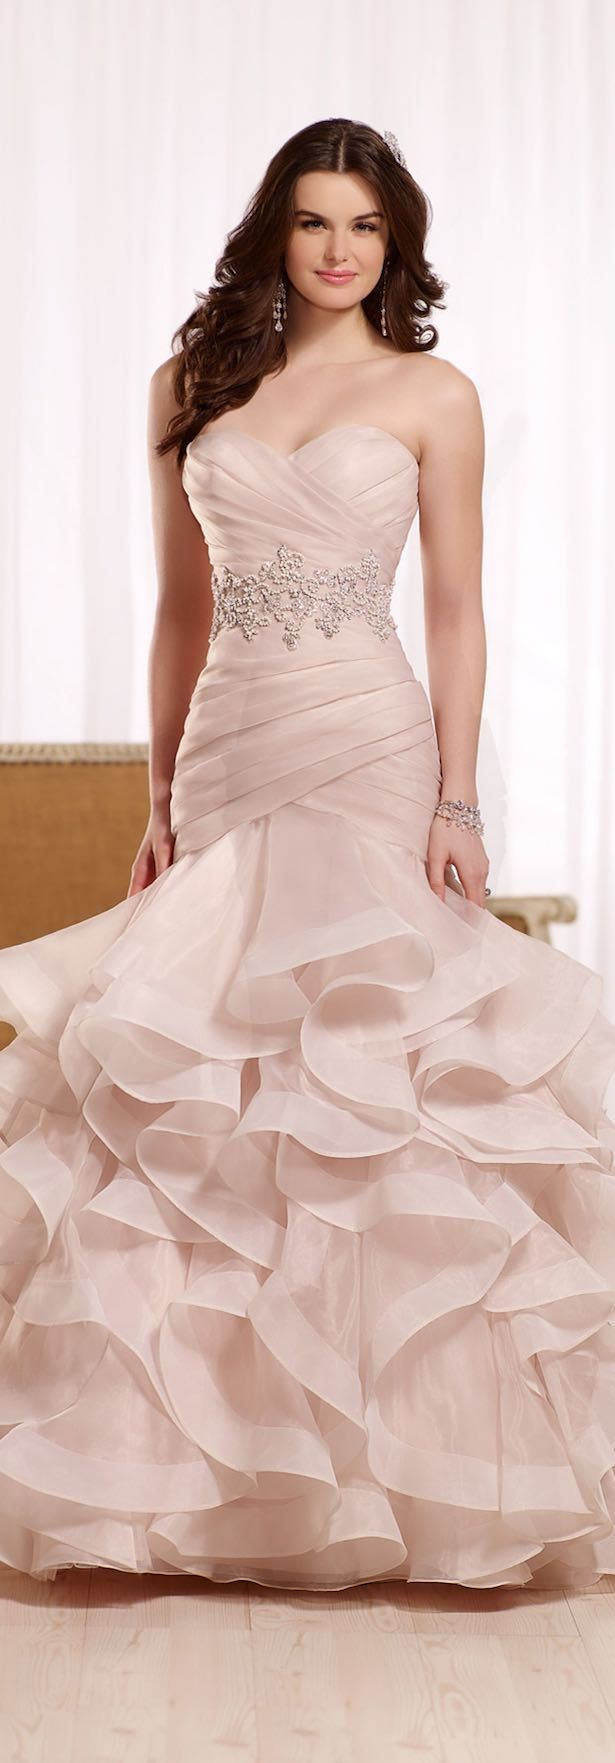 Mejores 2421 imágenes de Wedding Dresses en Pinterest | Vestidos de ...